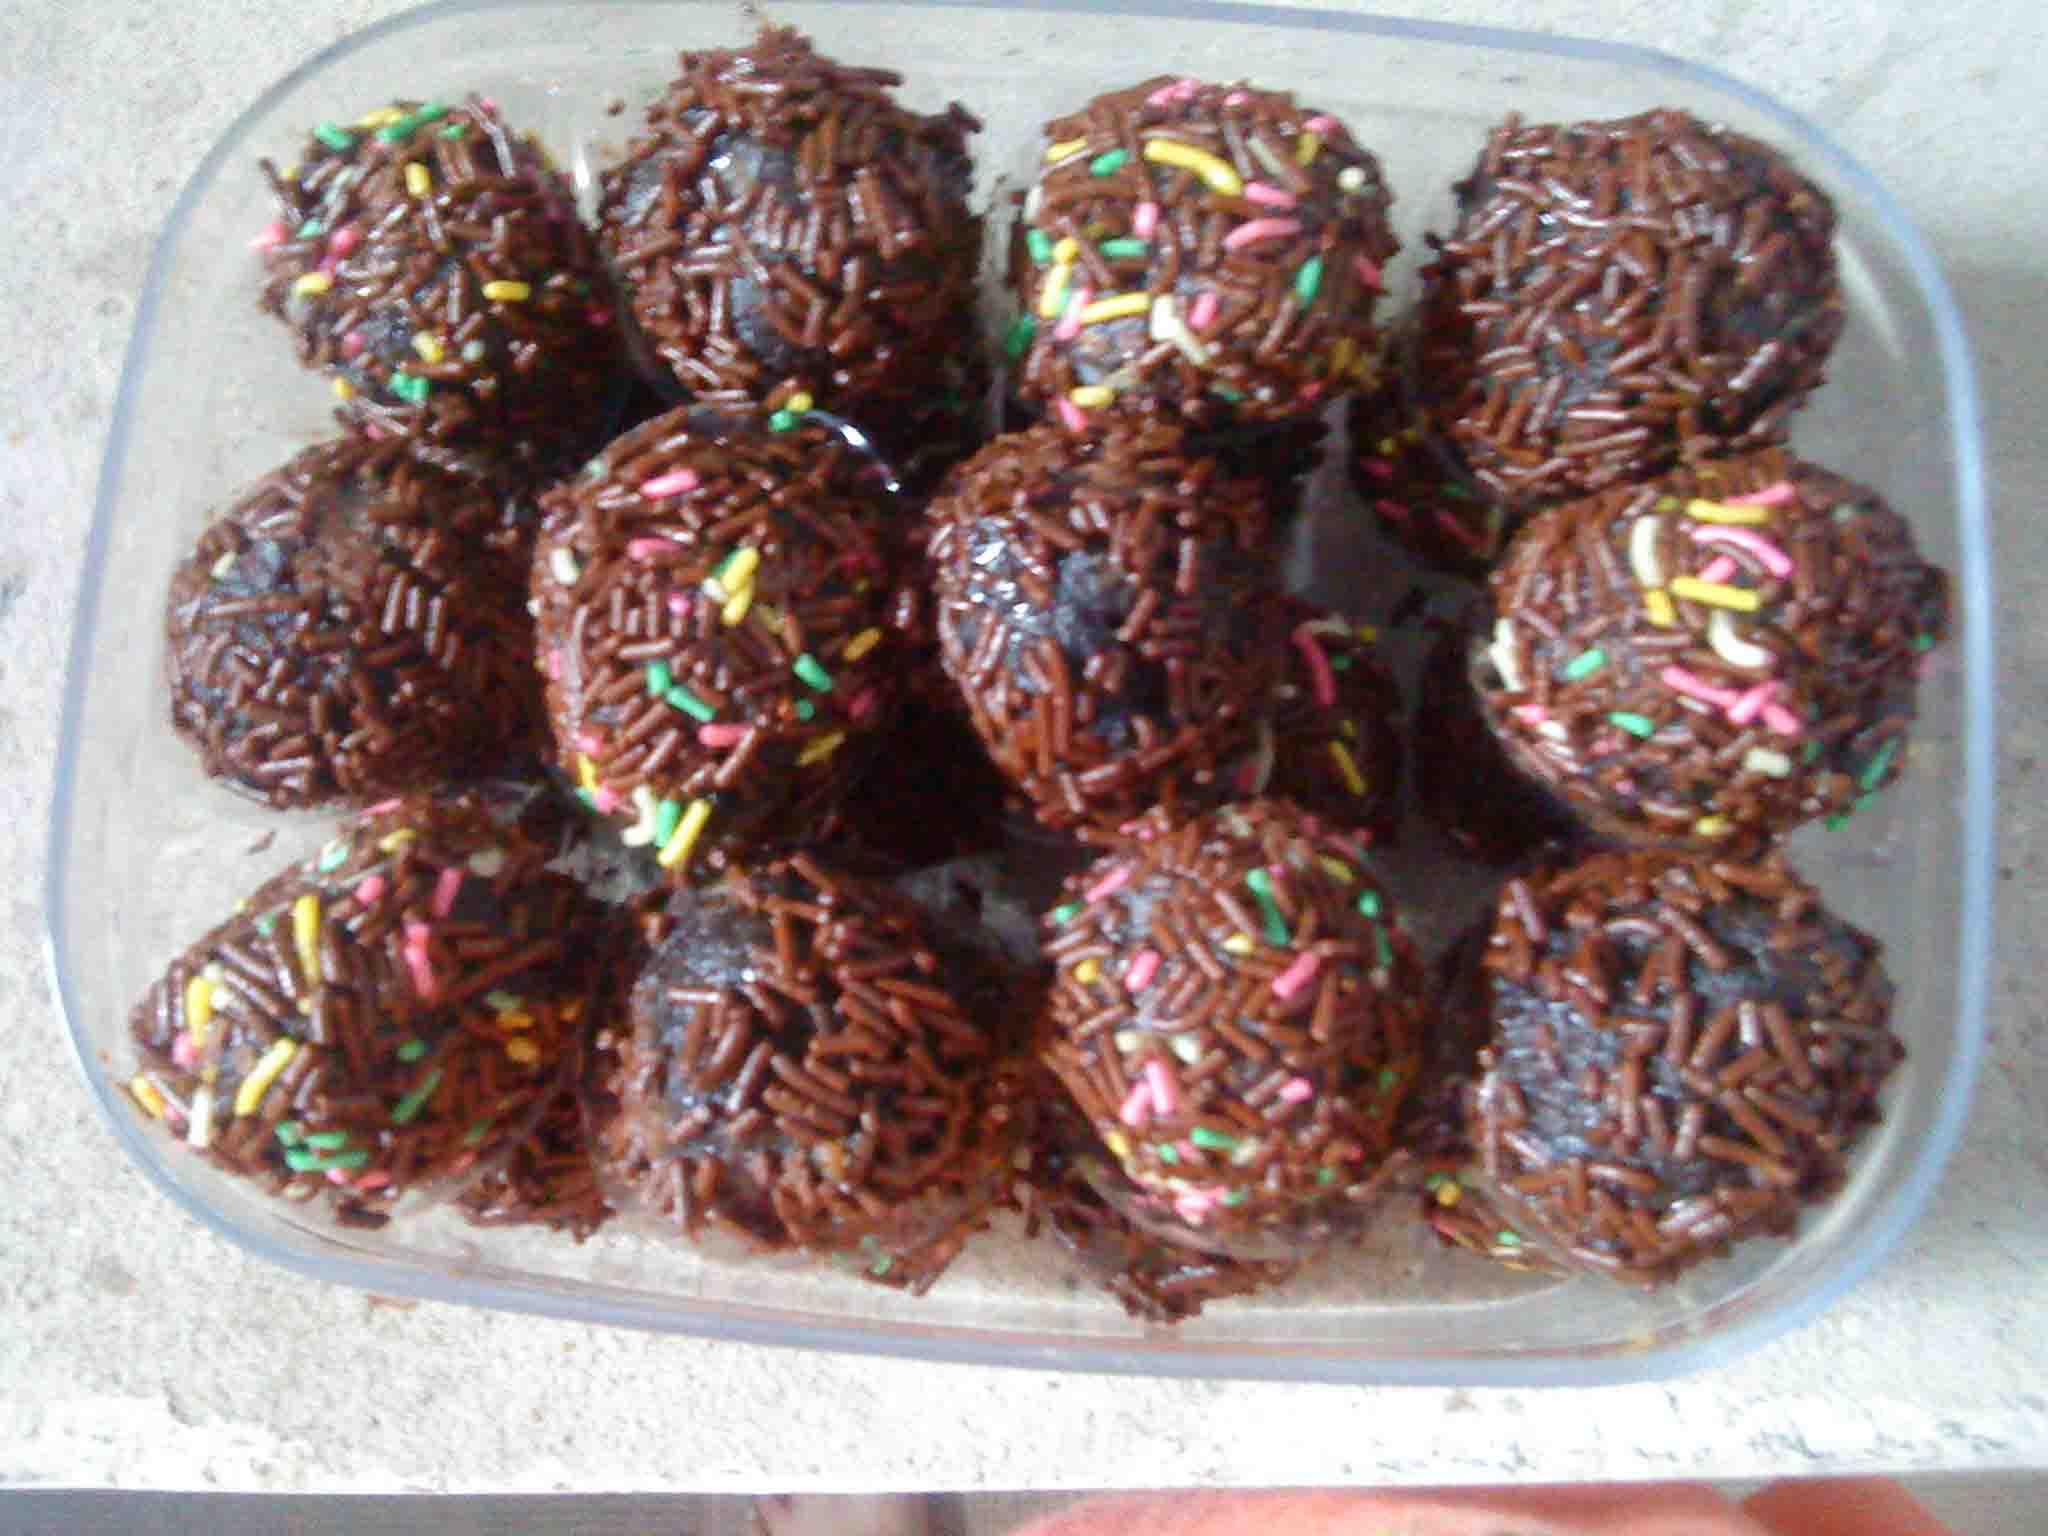 Resep Double Chocolate Cake Enak